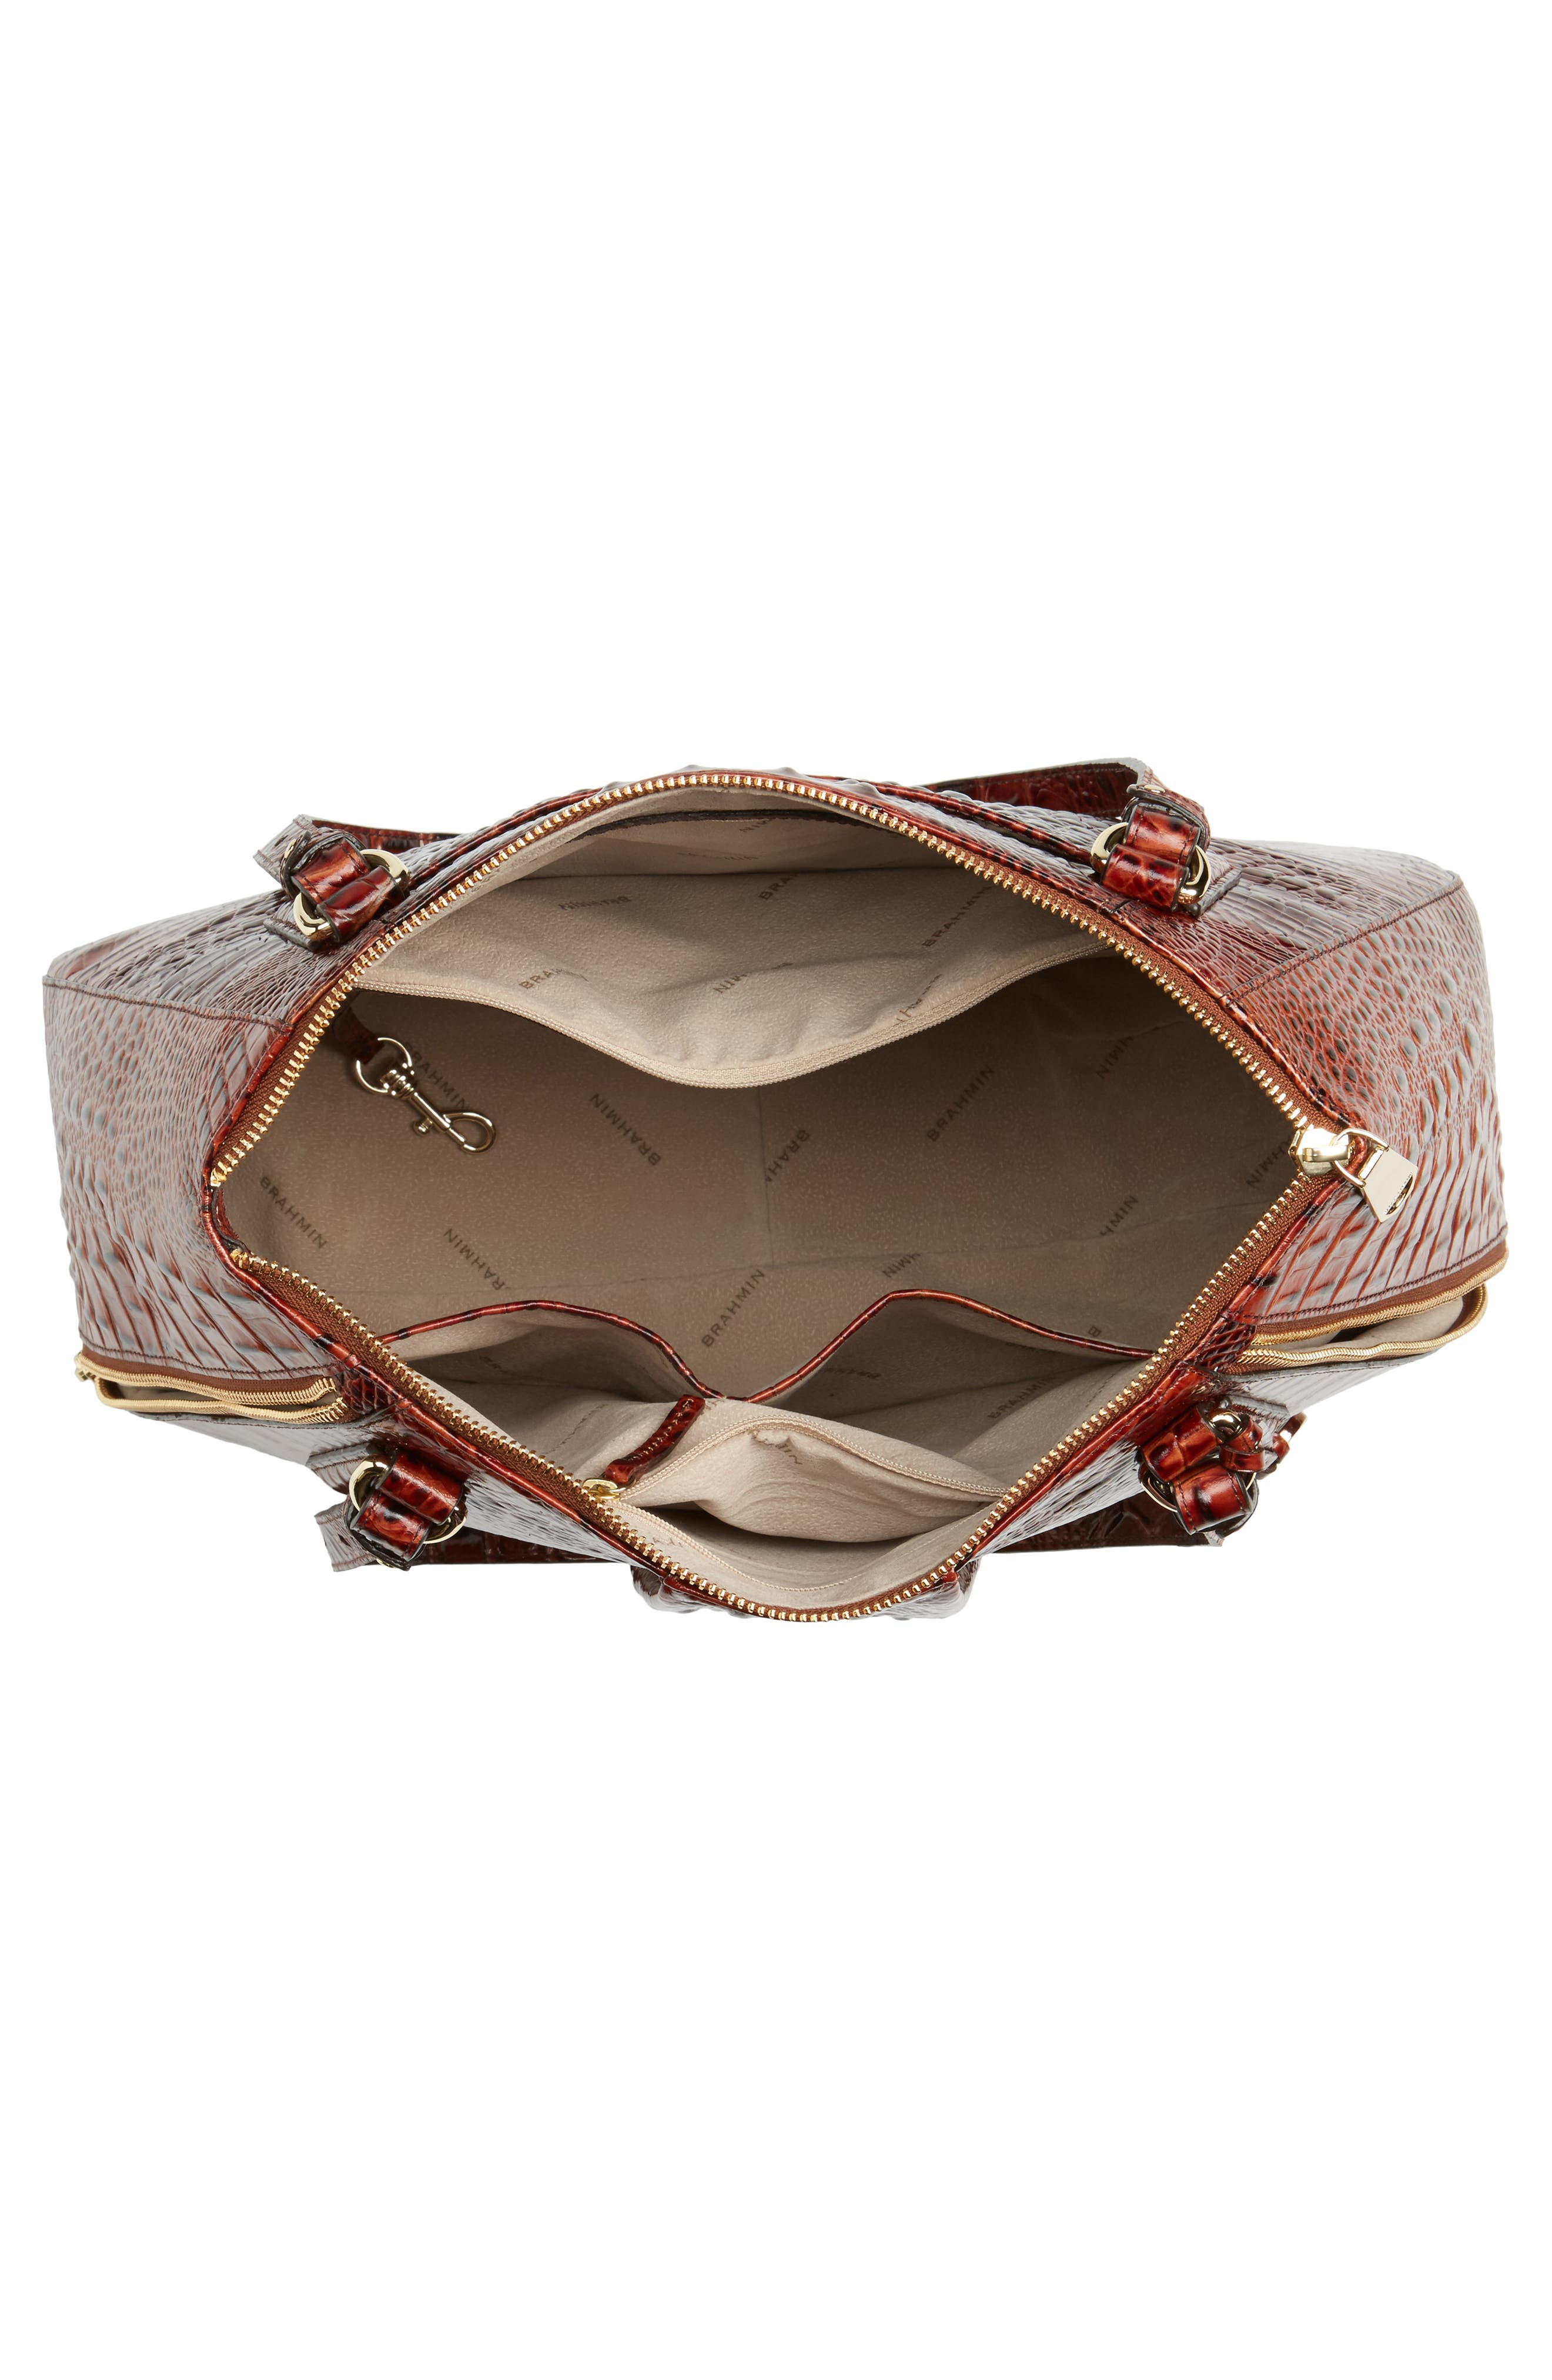 Melbourne - Adina Croc Embossed Leather Satchel,                             Alternate thumbnail 4, color,                             Pecan